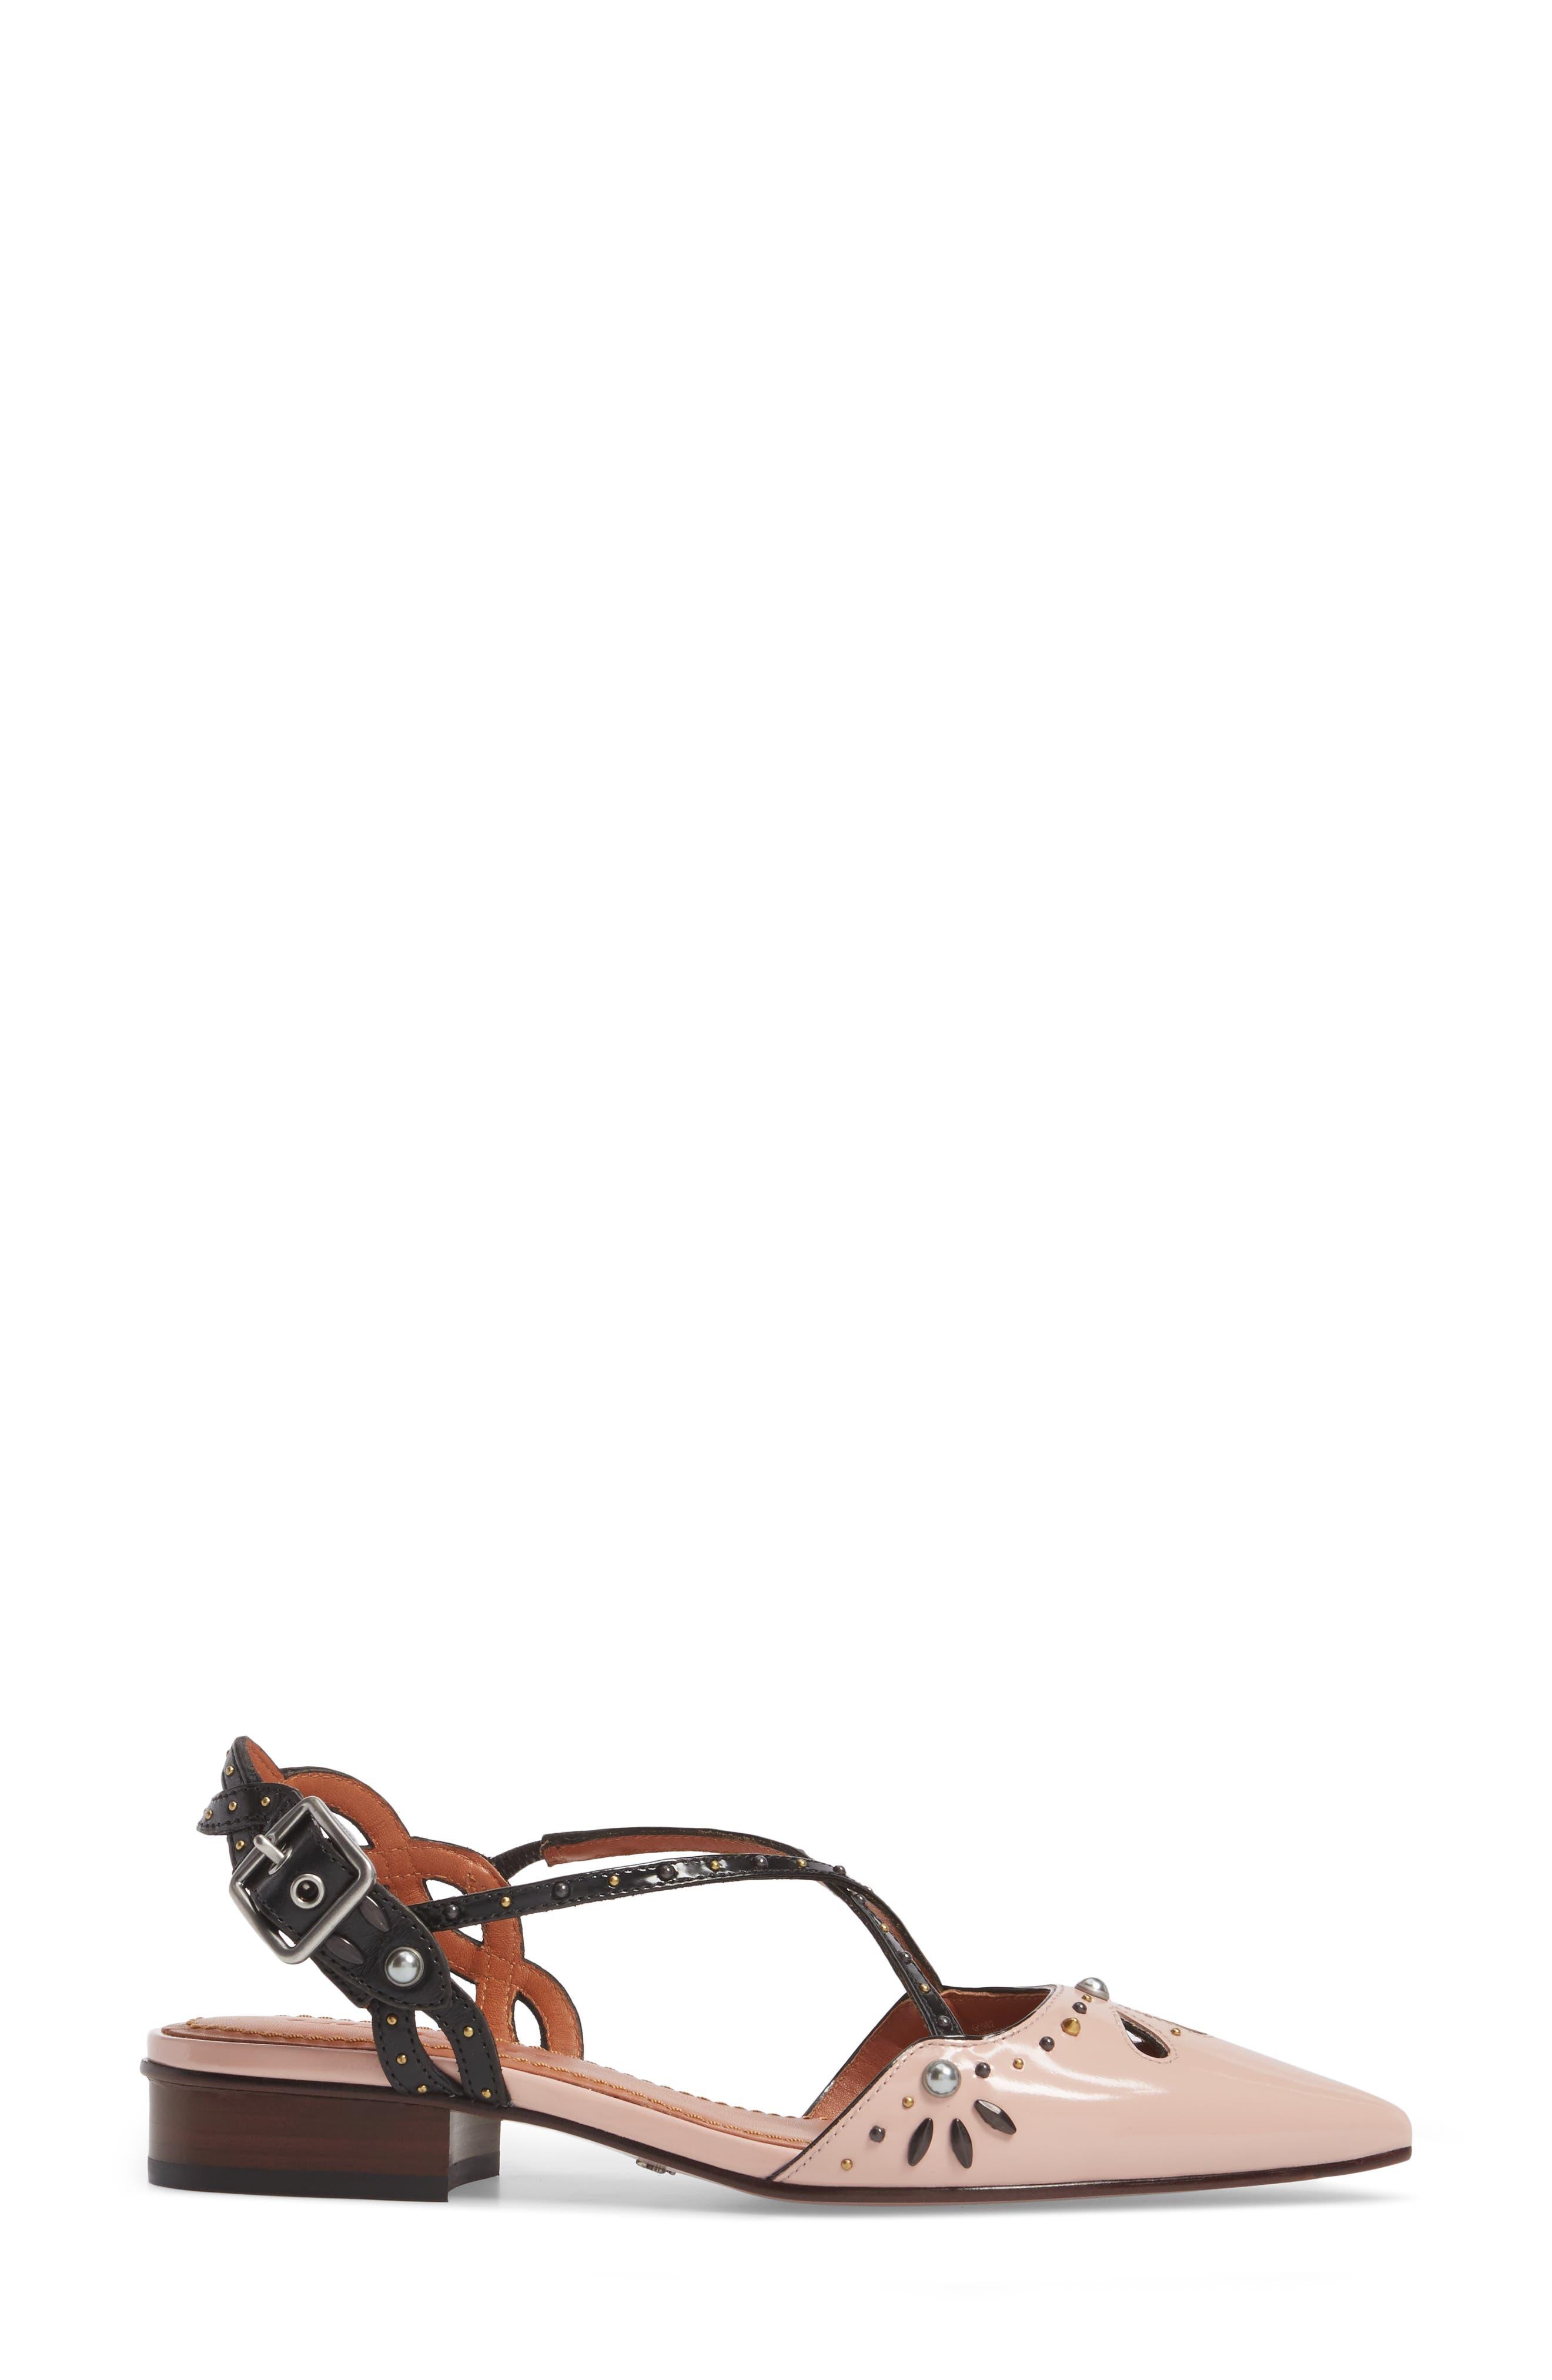 Prairie Rivet Sandal,                             Alternate thumbnail 3, color,                             Pink/ Black Leather